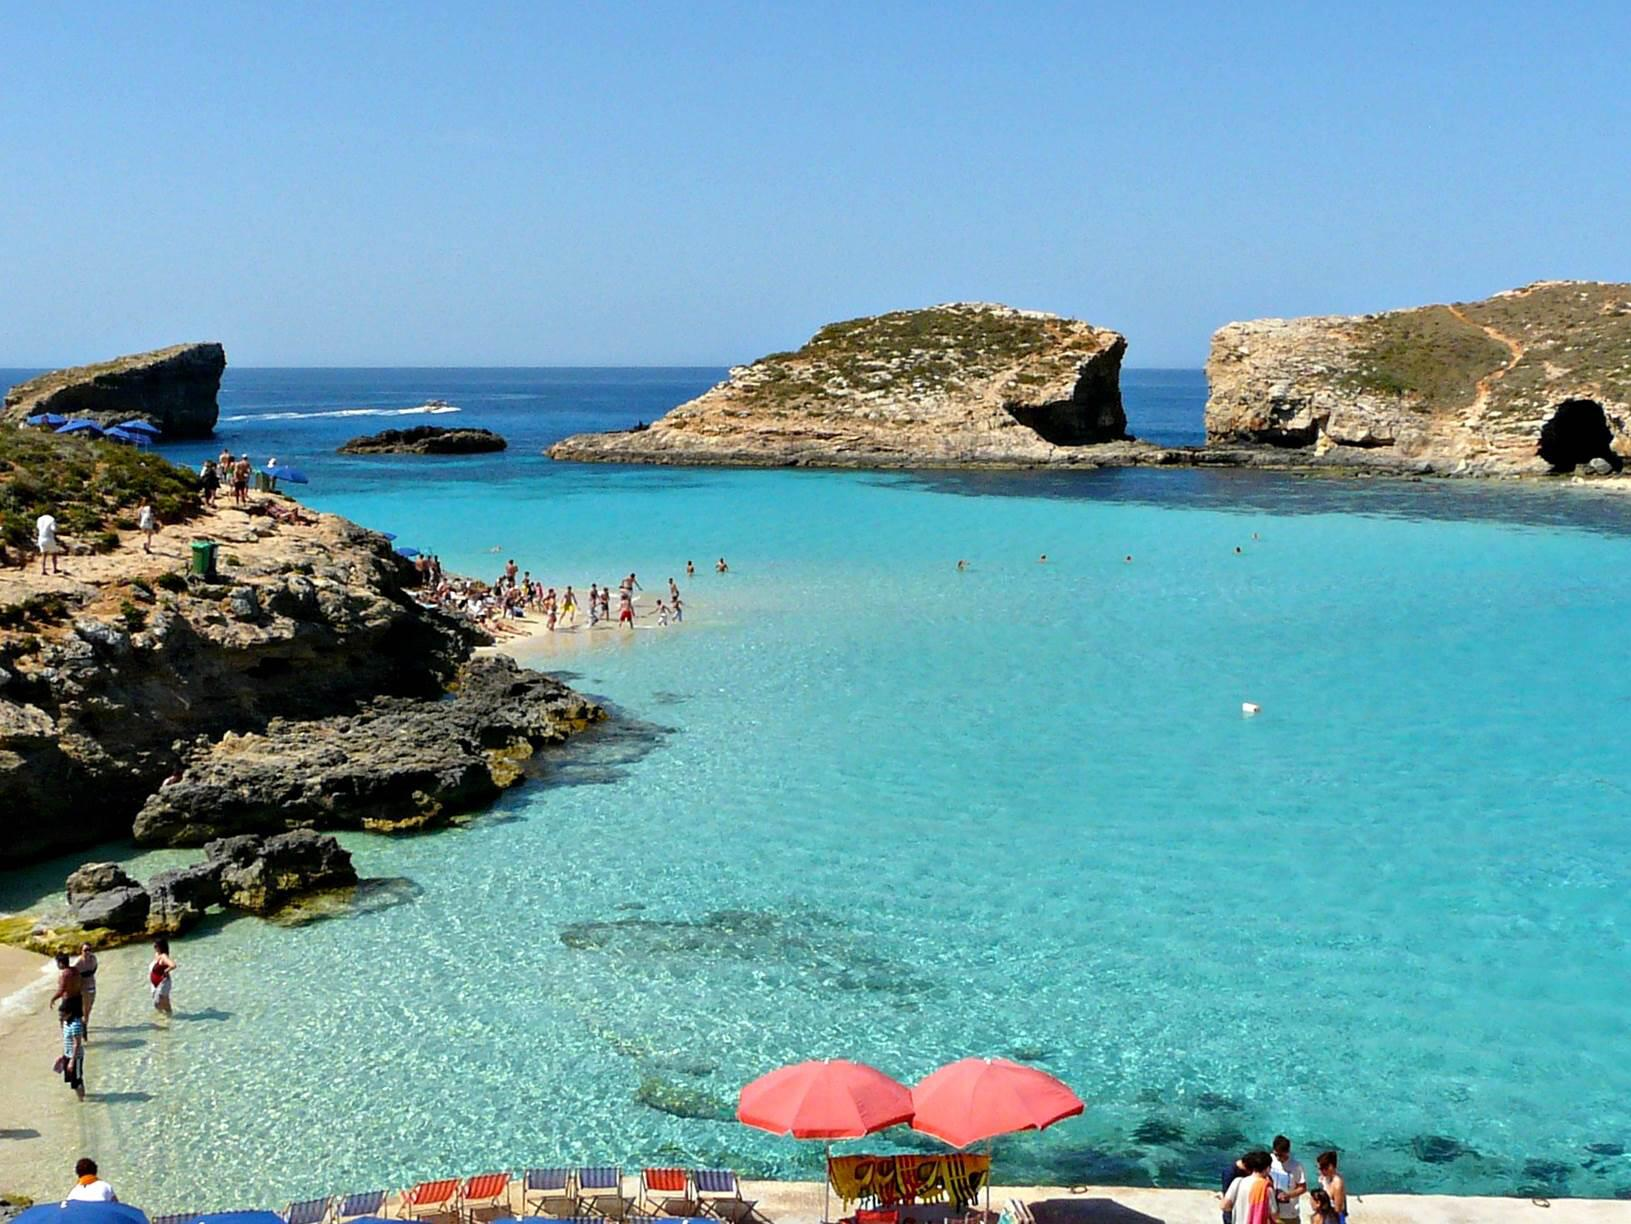 Bild zu Malta, die Blaue Lagune